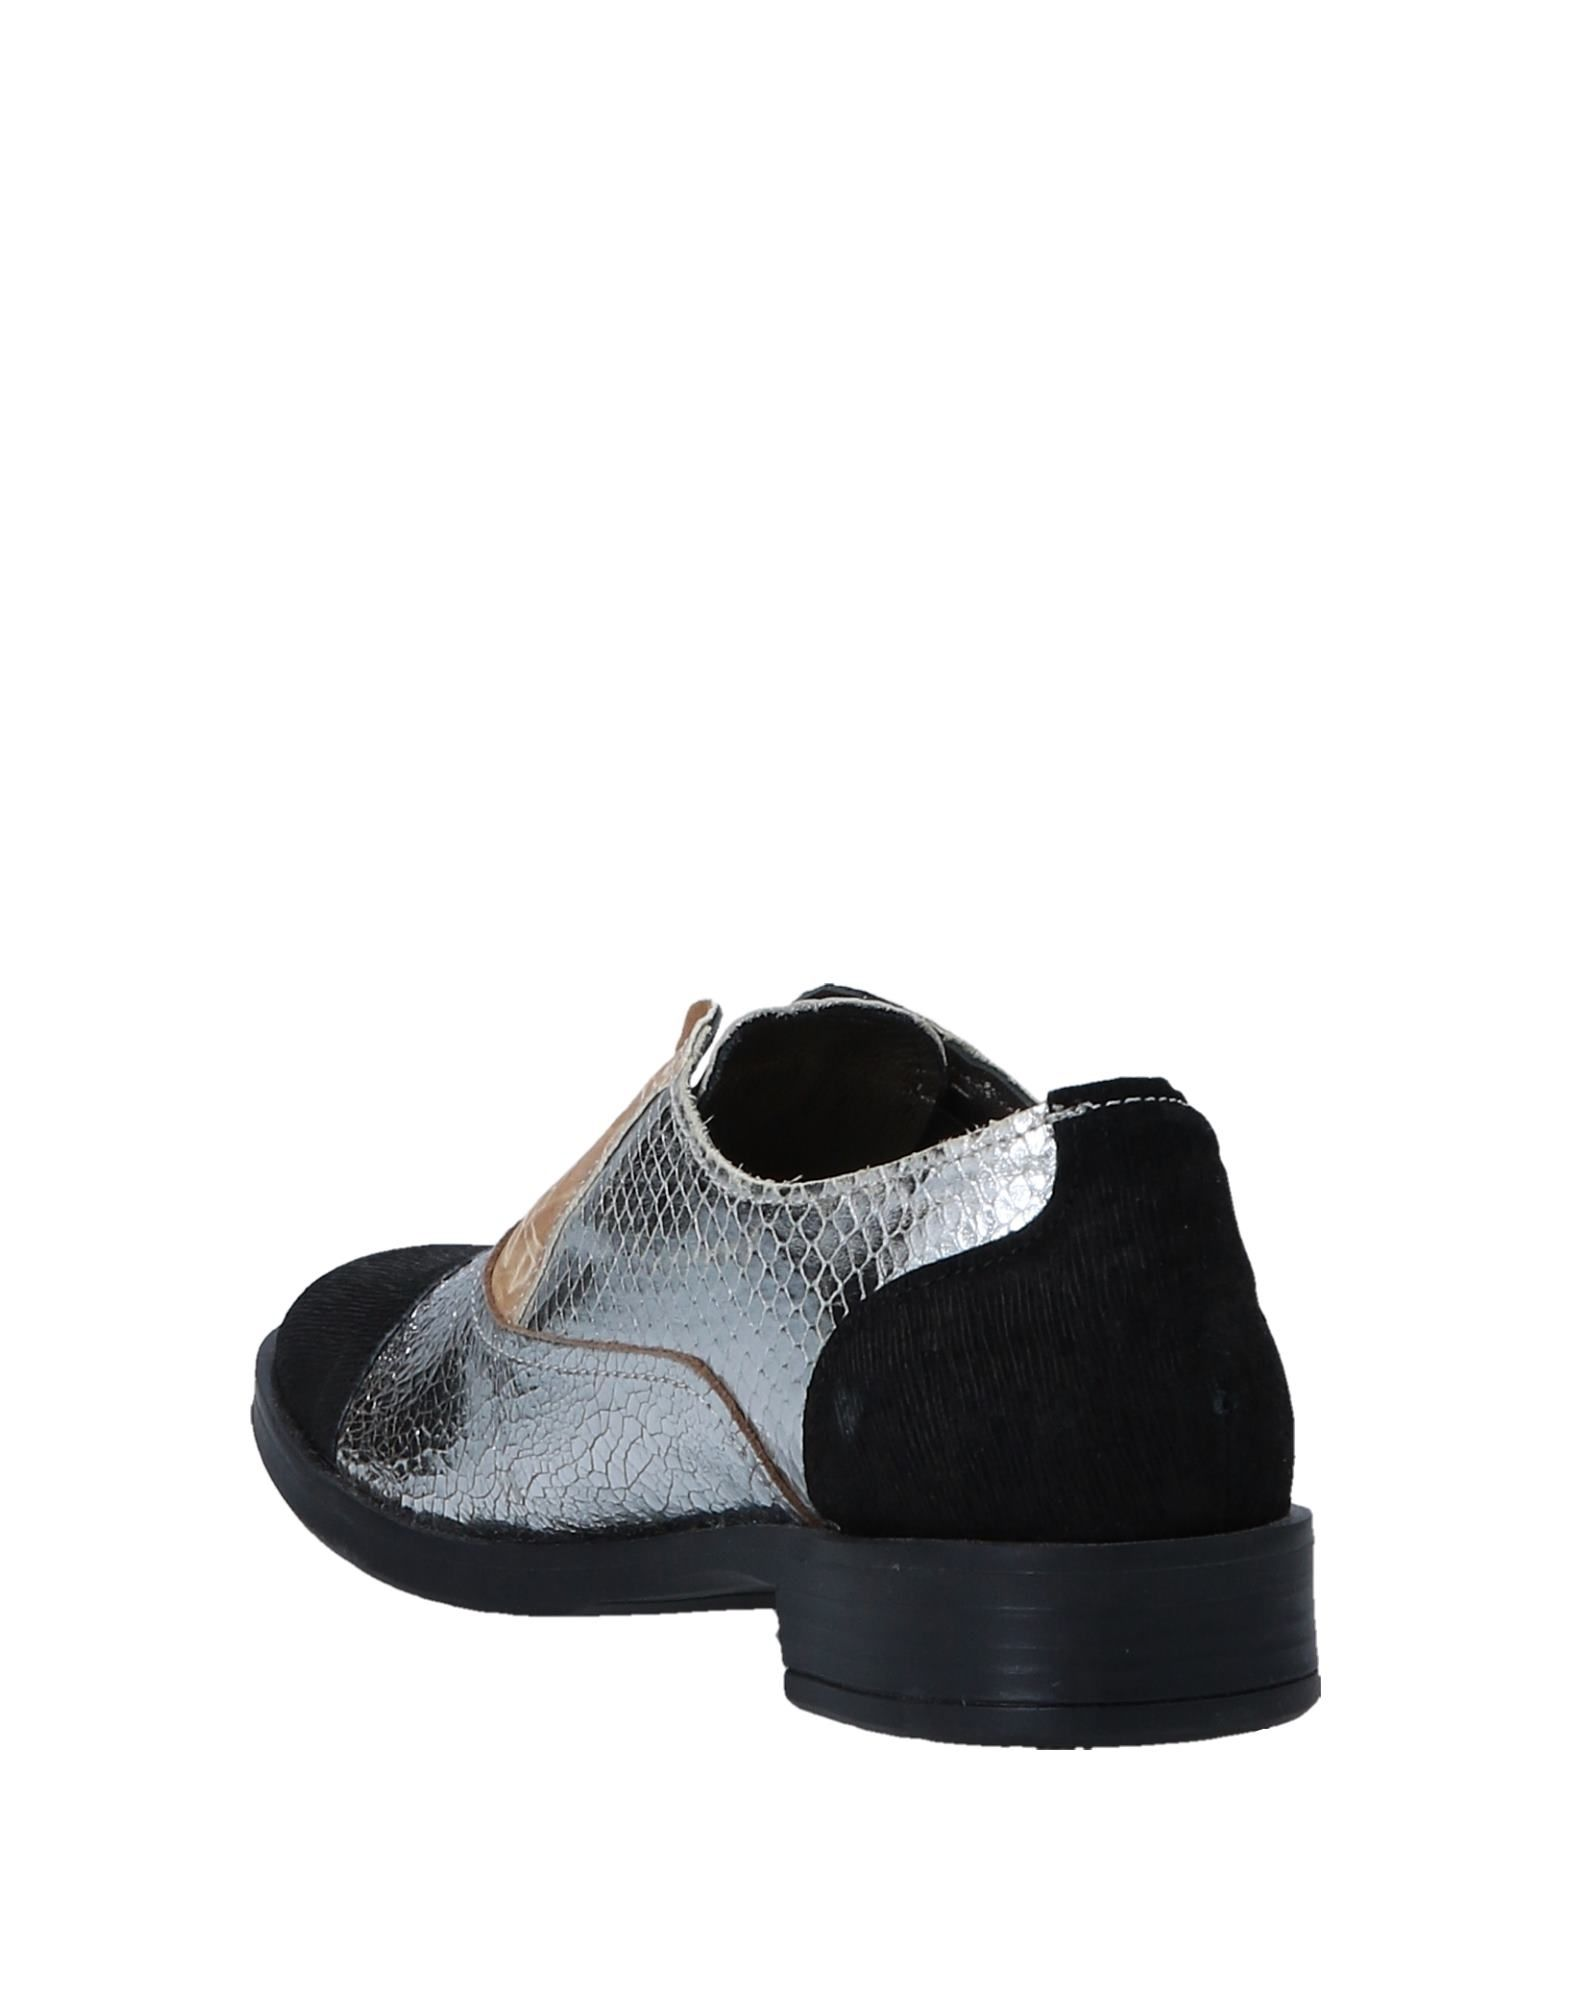 Ebarrito Gute Mokassins Damen  11554930BQ Gute Ebarrito Qualität beliebte Schuhe dc8ca6